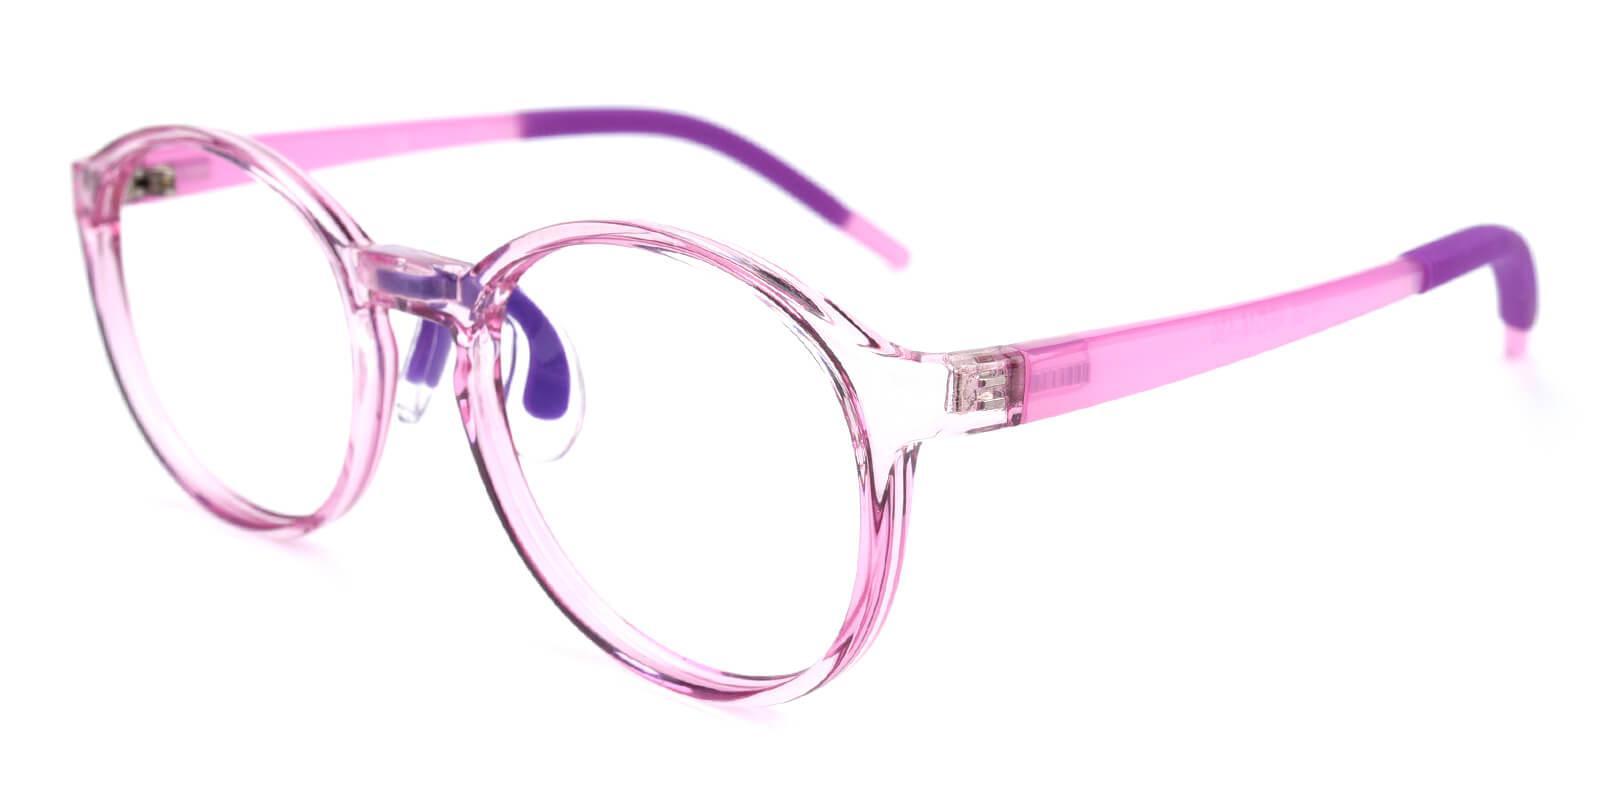 Chigor-Purple-Round-TR-Eyeglasses-detail